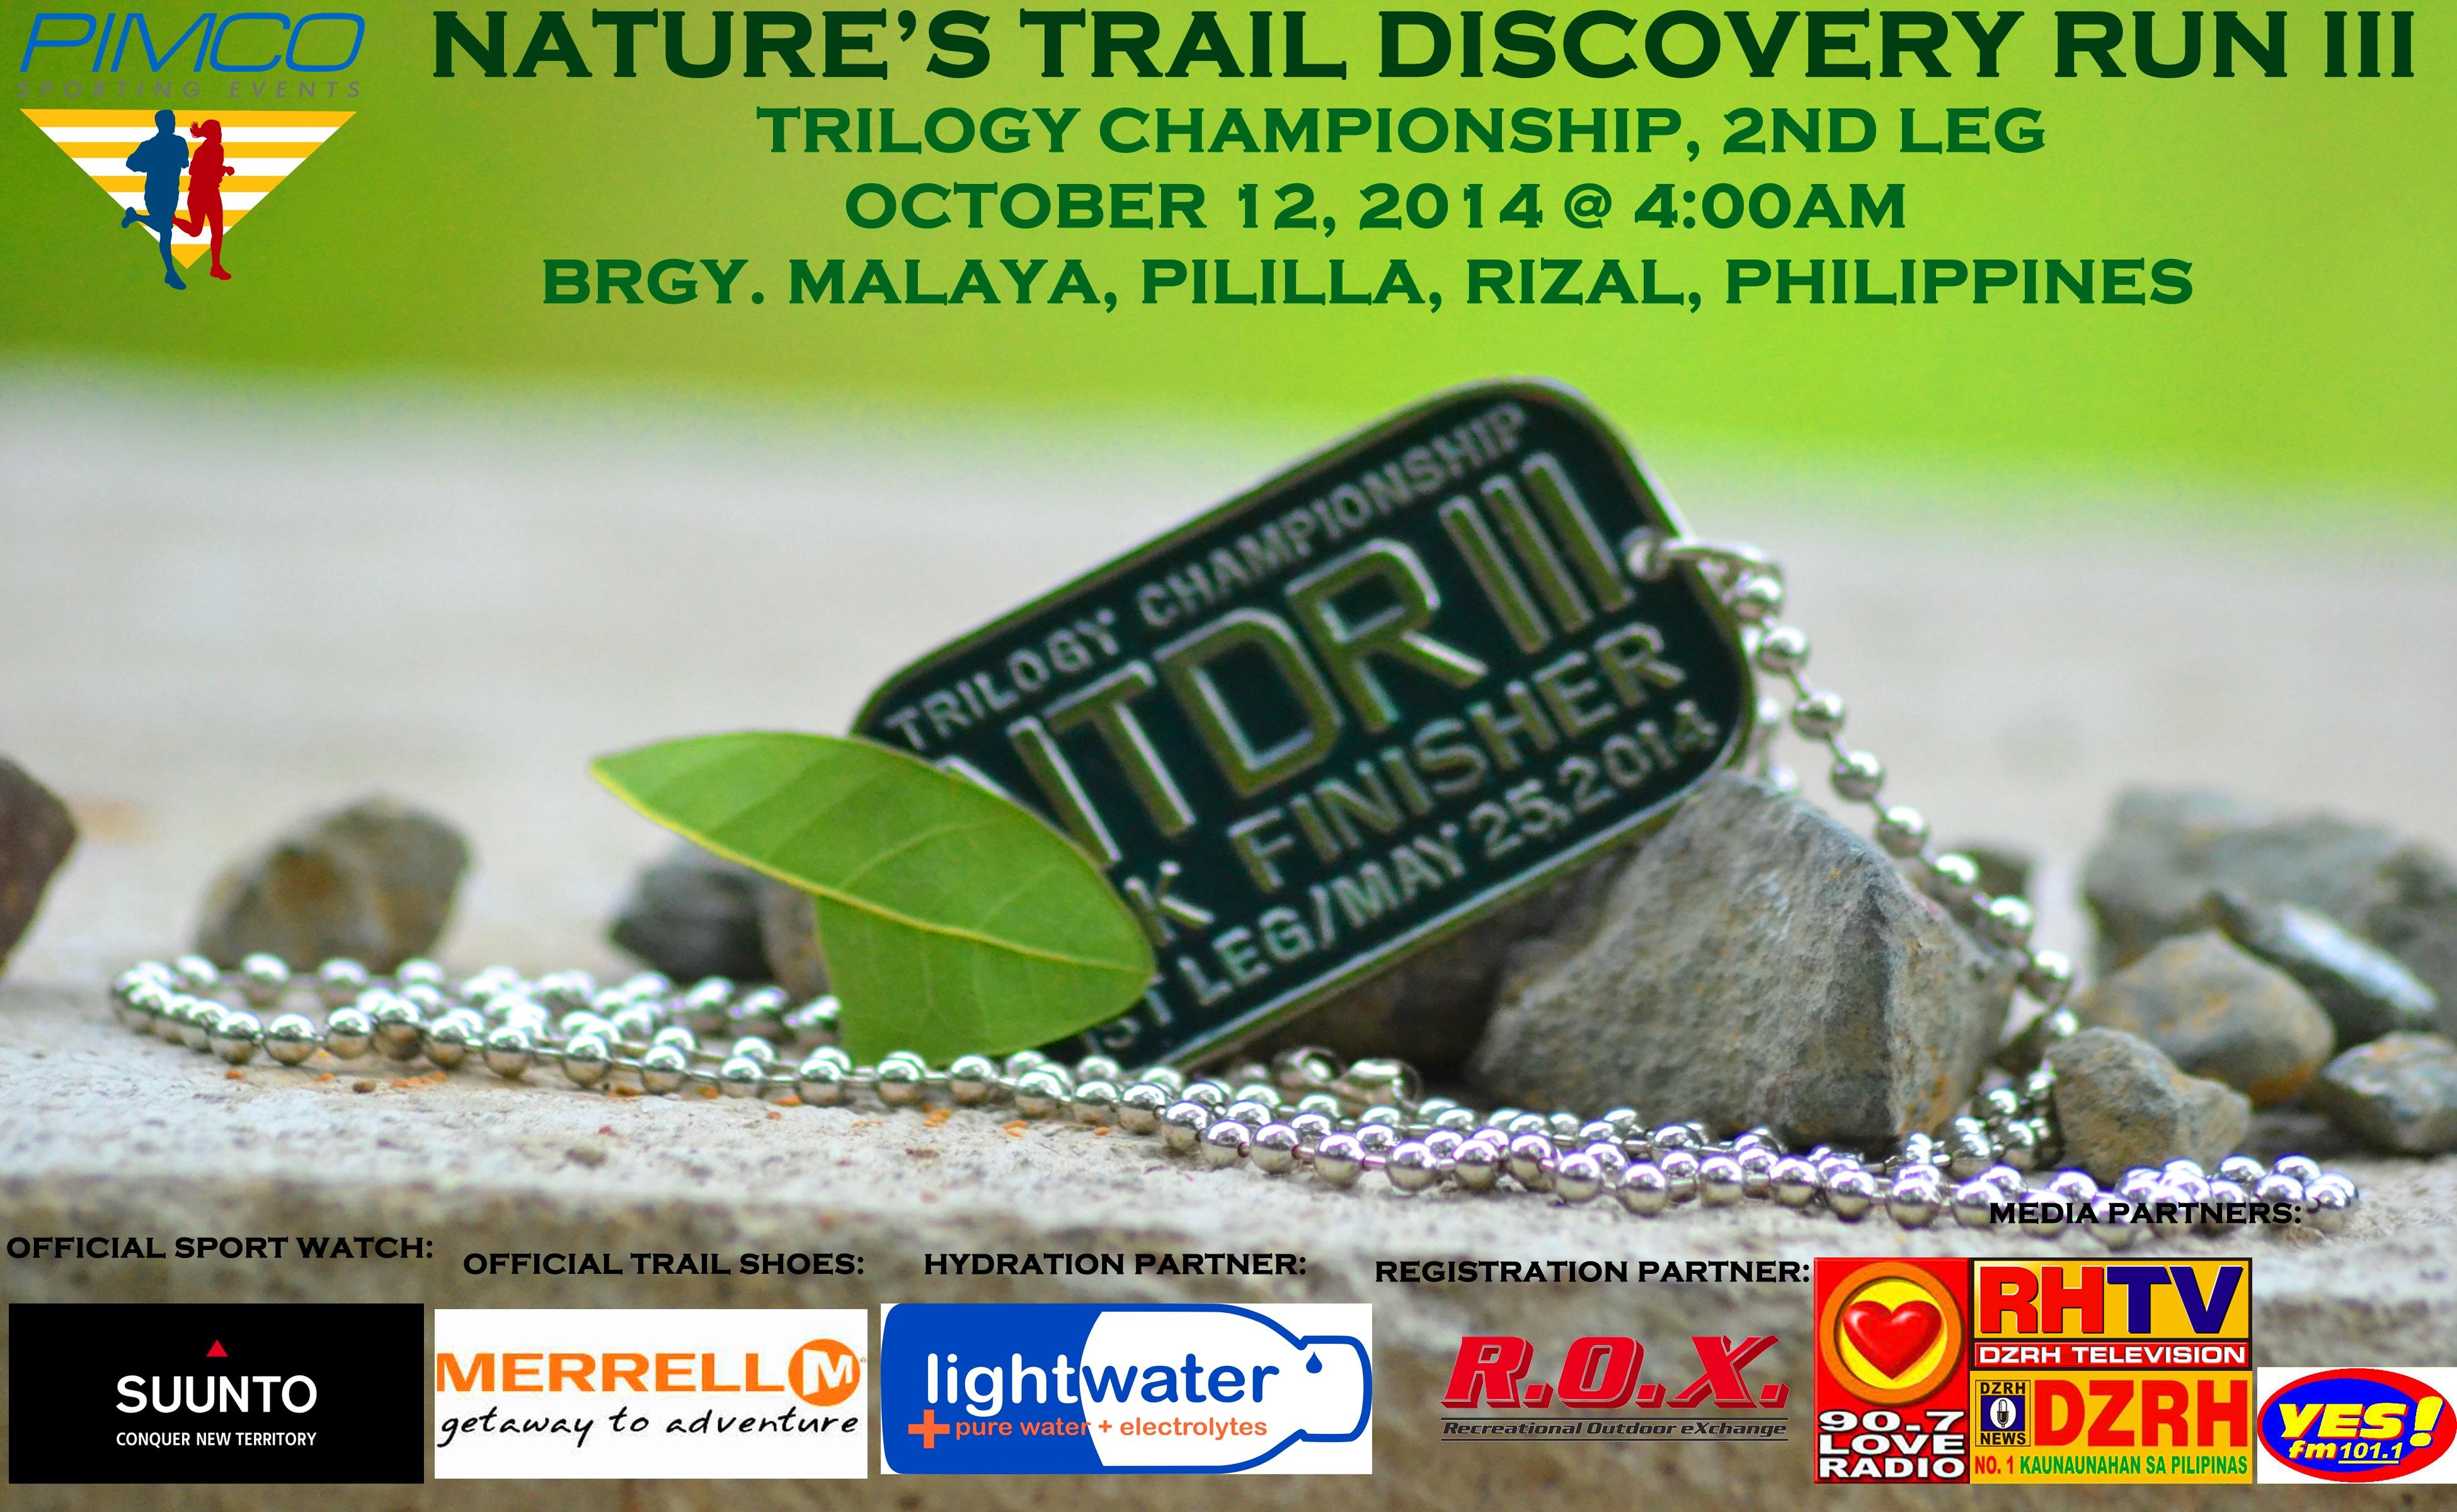 NTDR-III-trilogy-championships-2nd-leg-2014-poster